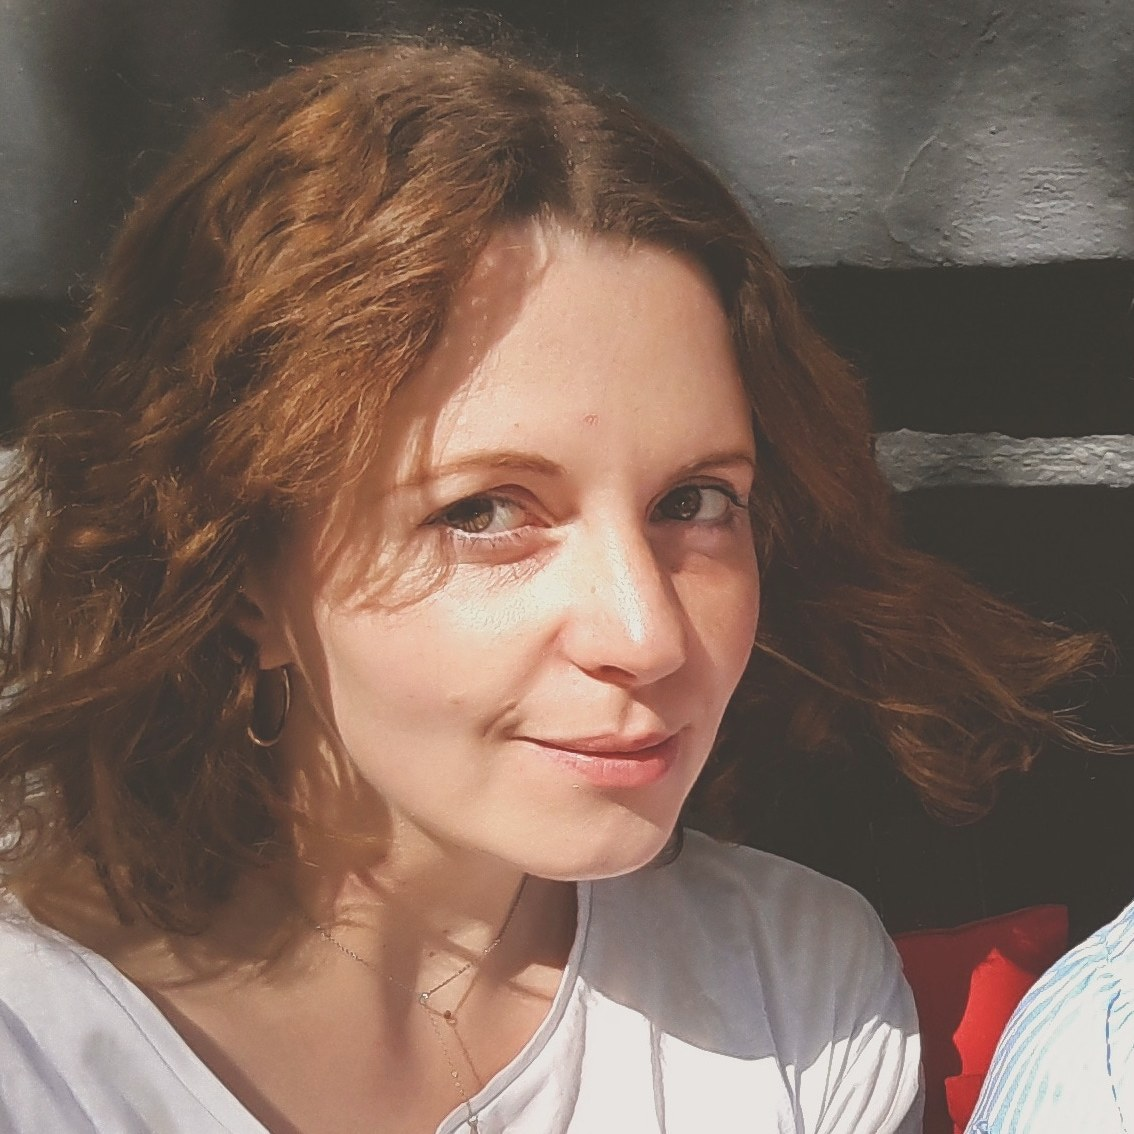 BUDDY Josefine Knuth-Pollok